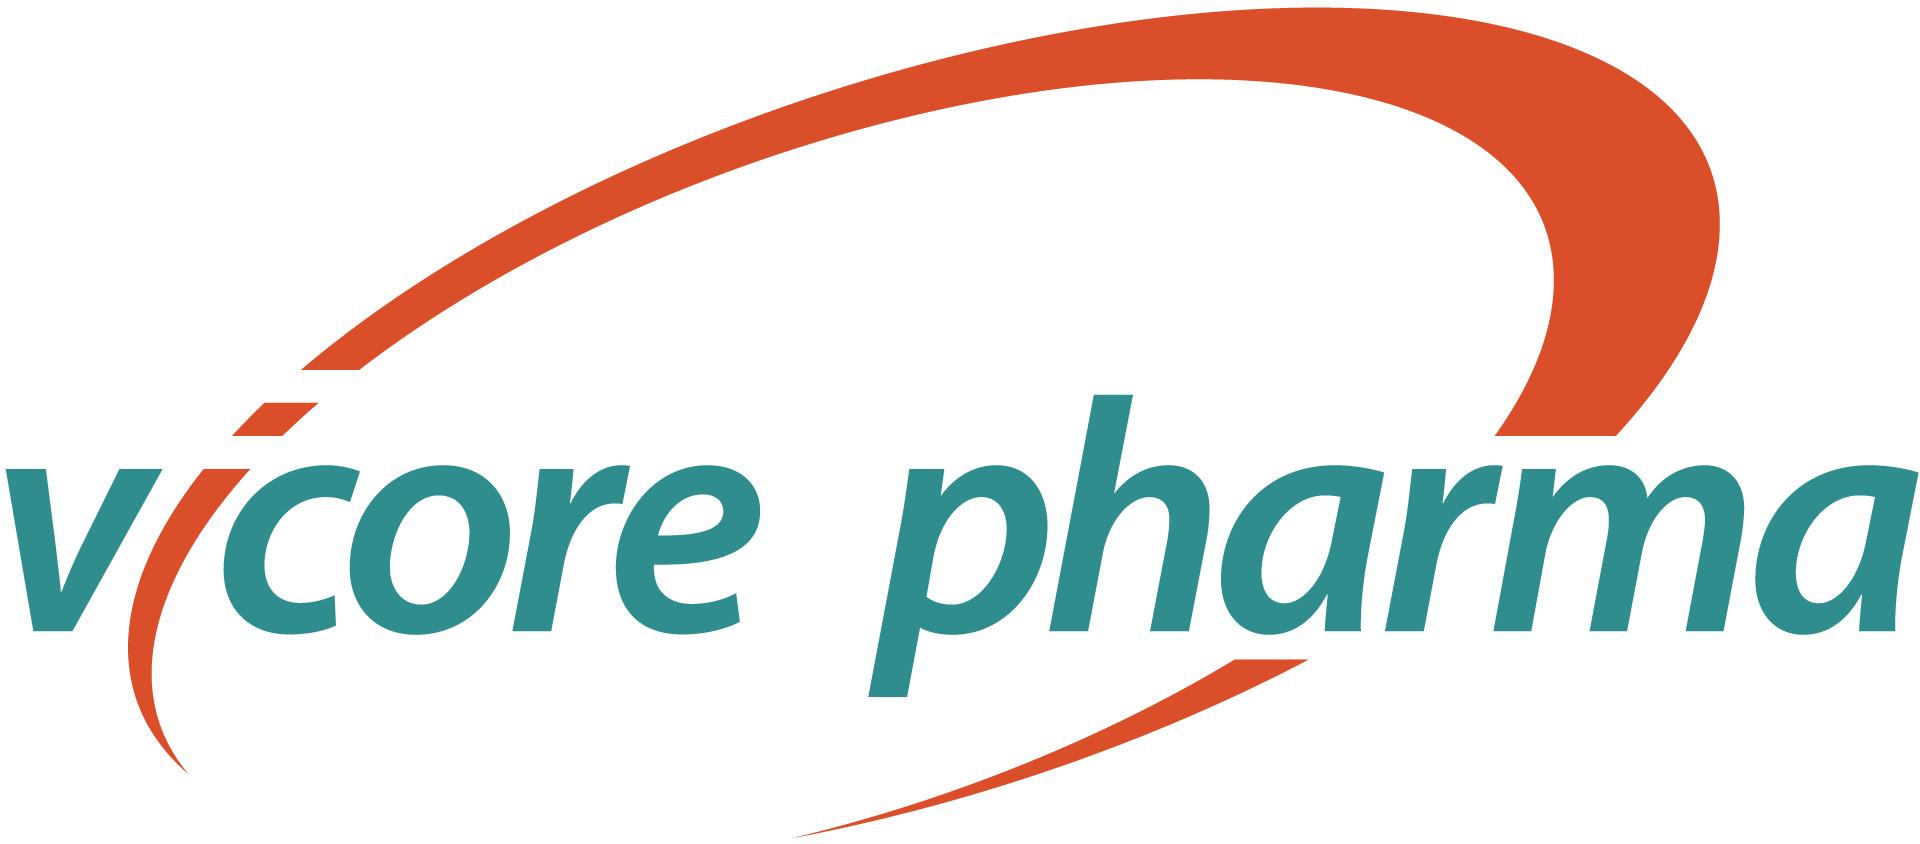 vicore_pharma.jpg